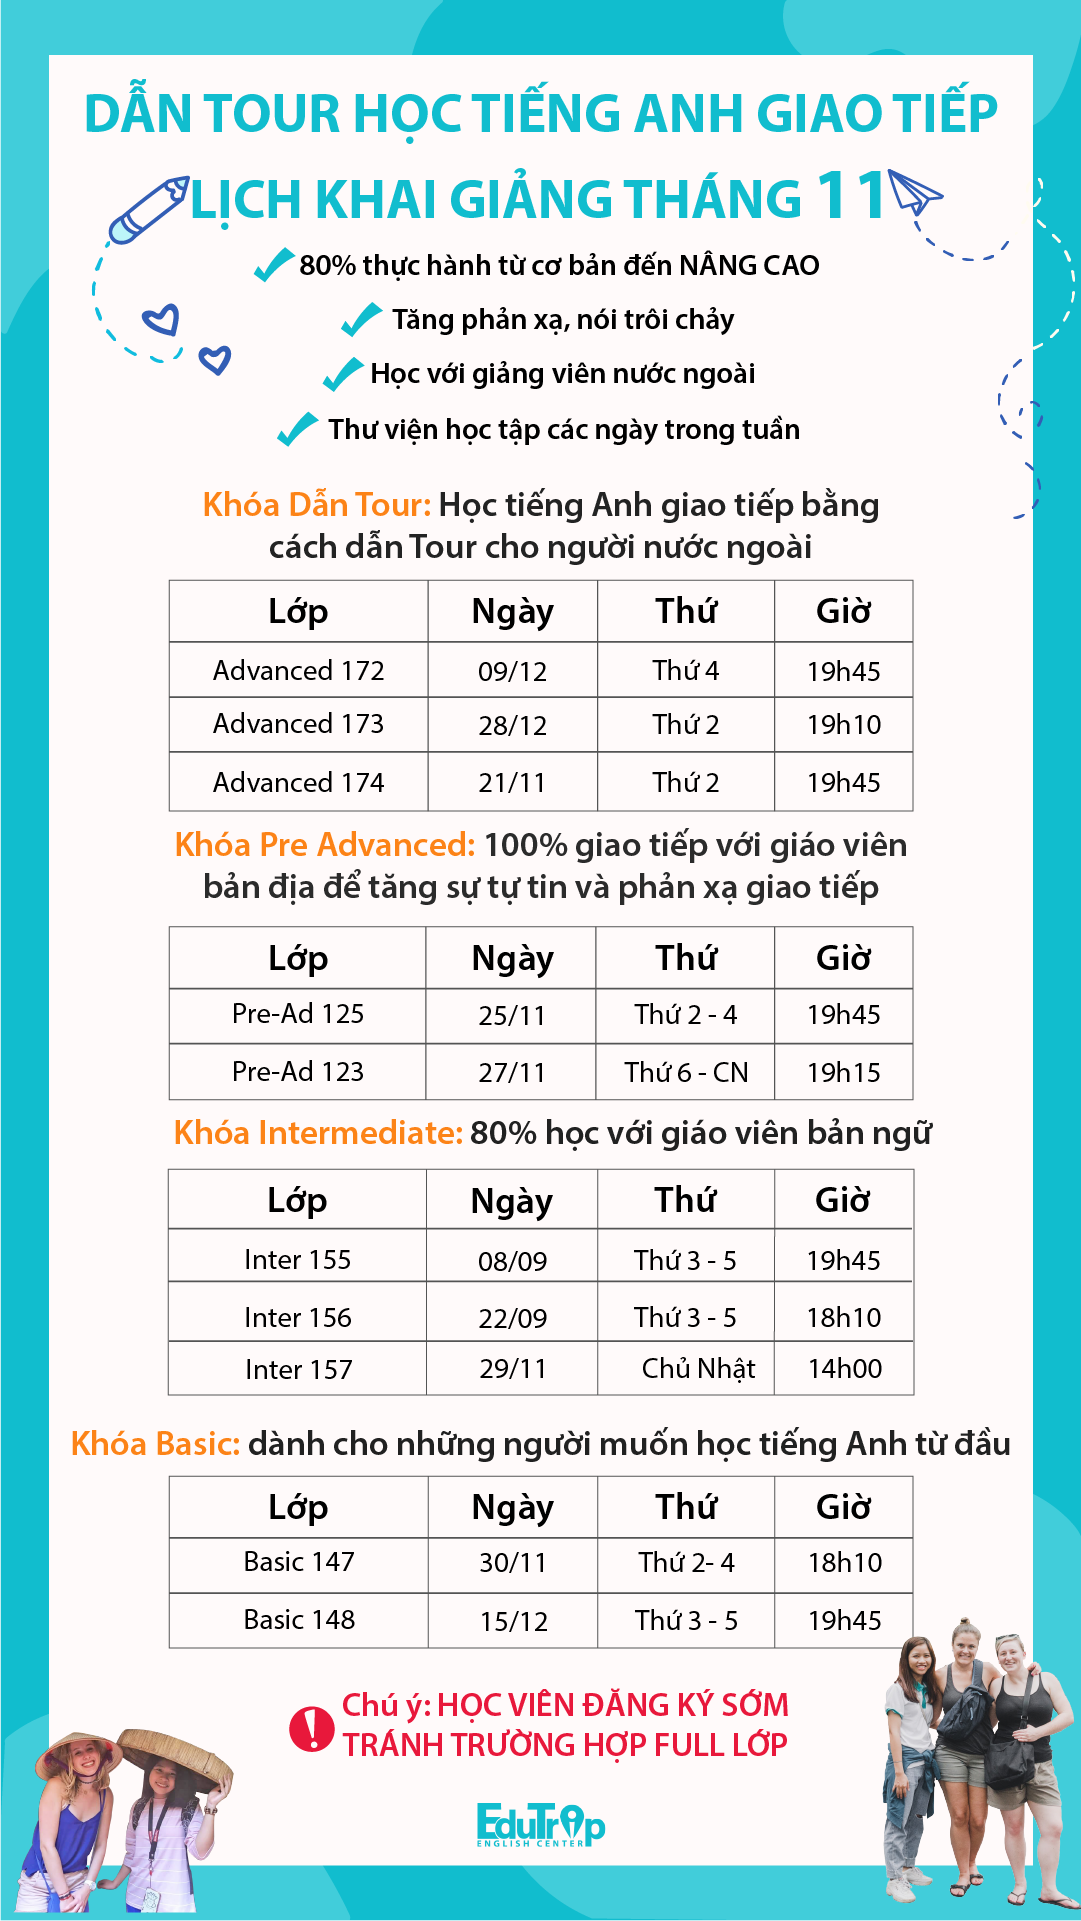 Lich Khai Giang Thang 11 mobi